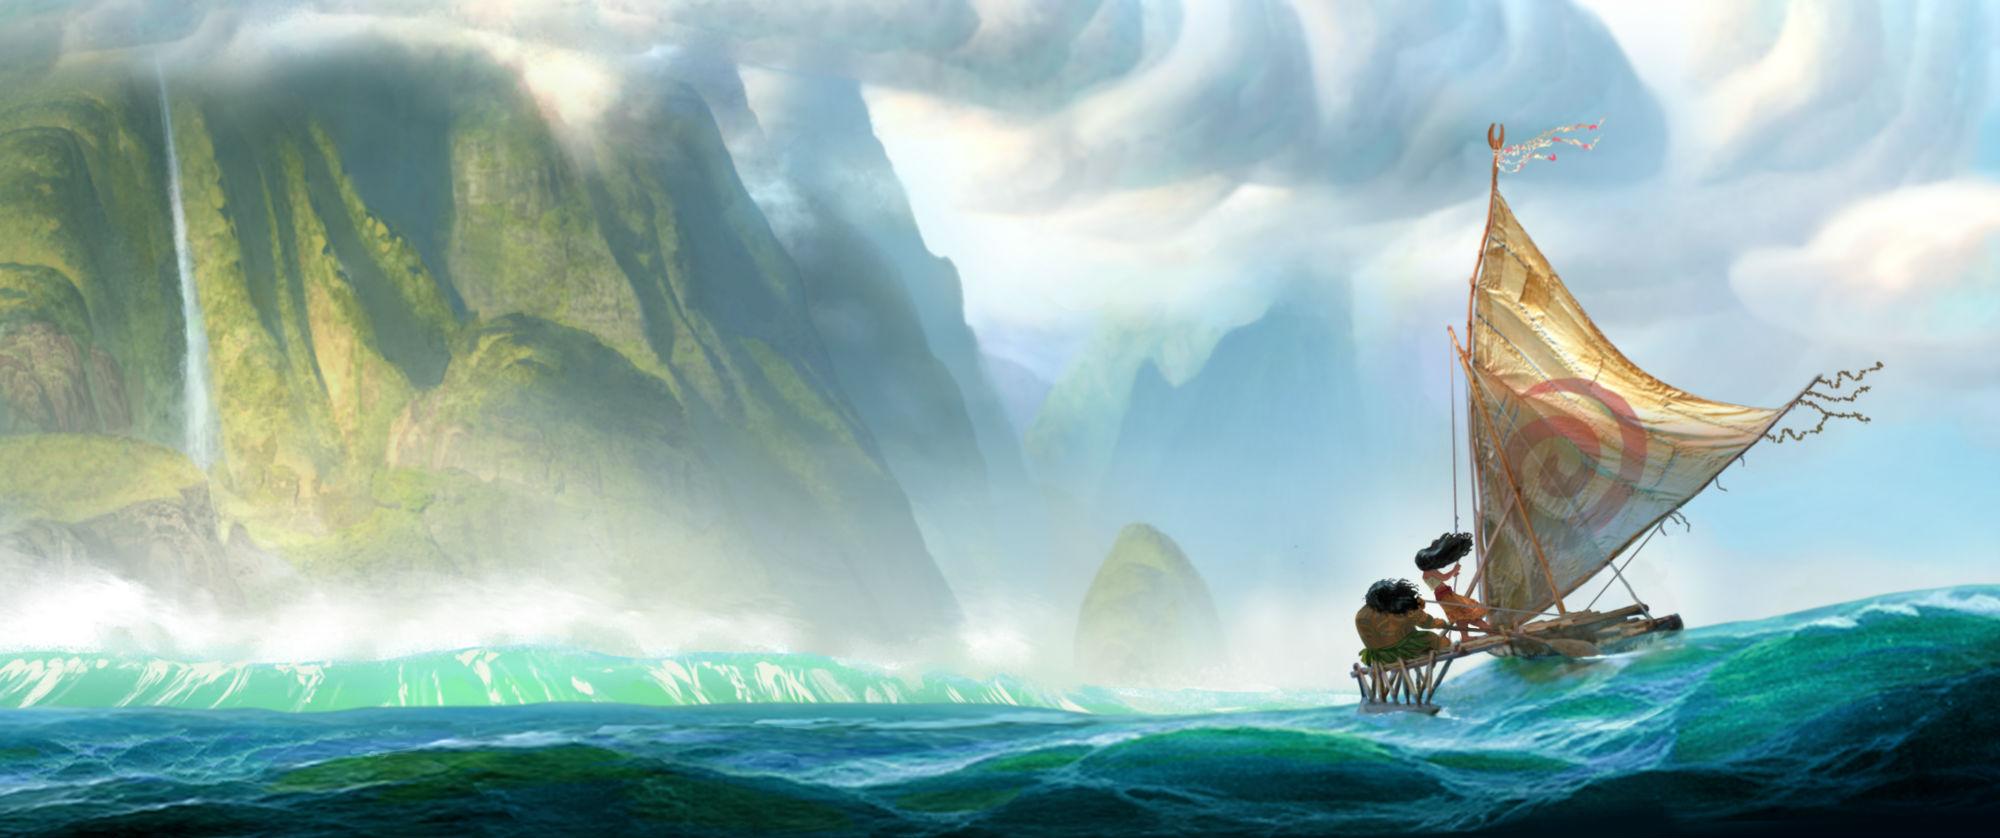 First official concept art for Walt Disney Animation Studios' Moana.